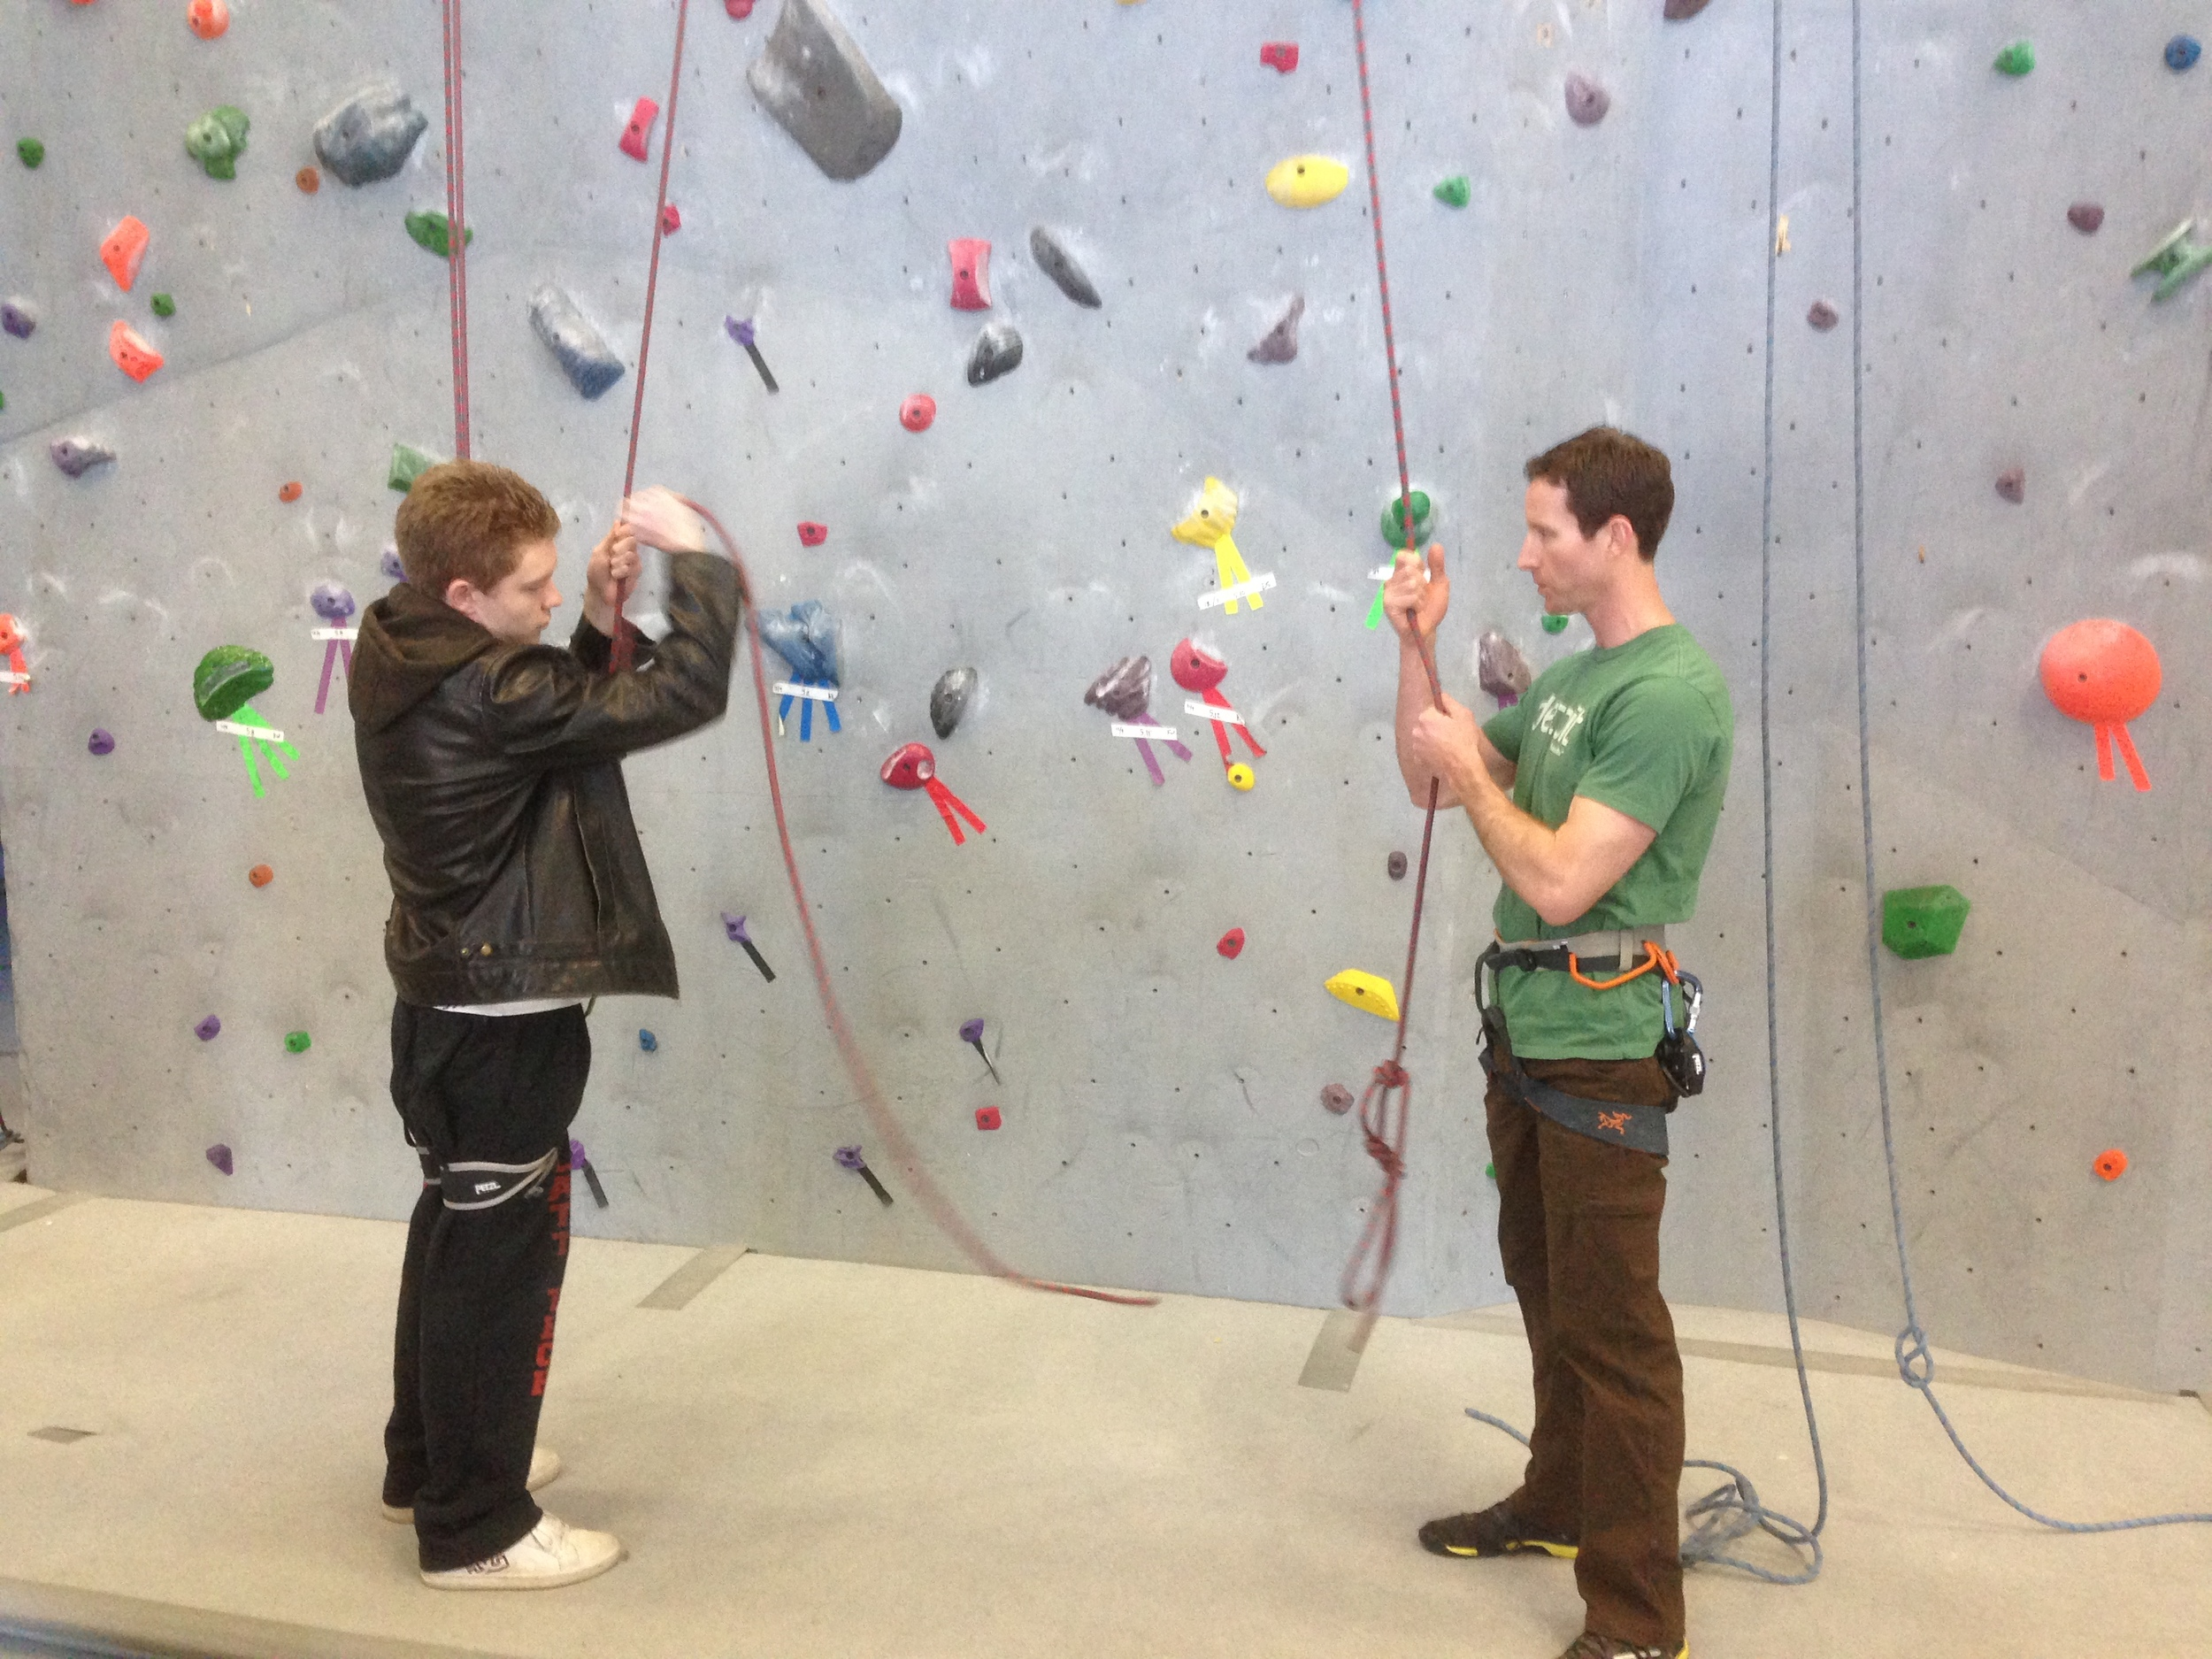 Climbing instructor training